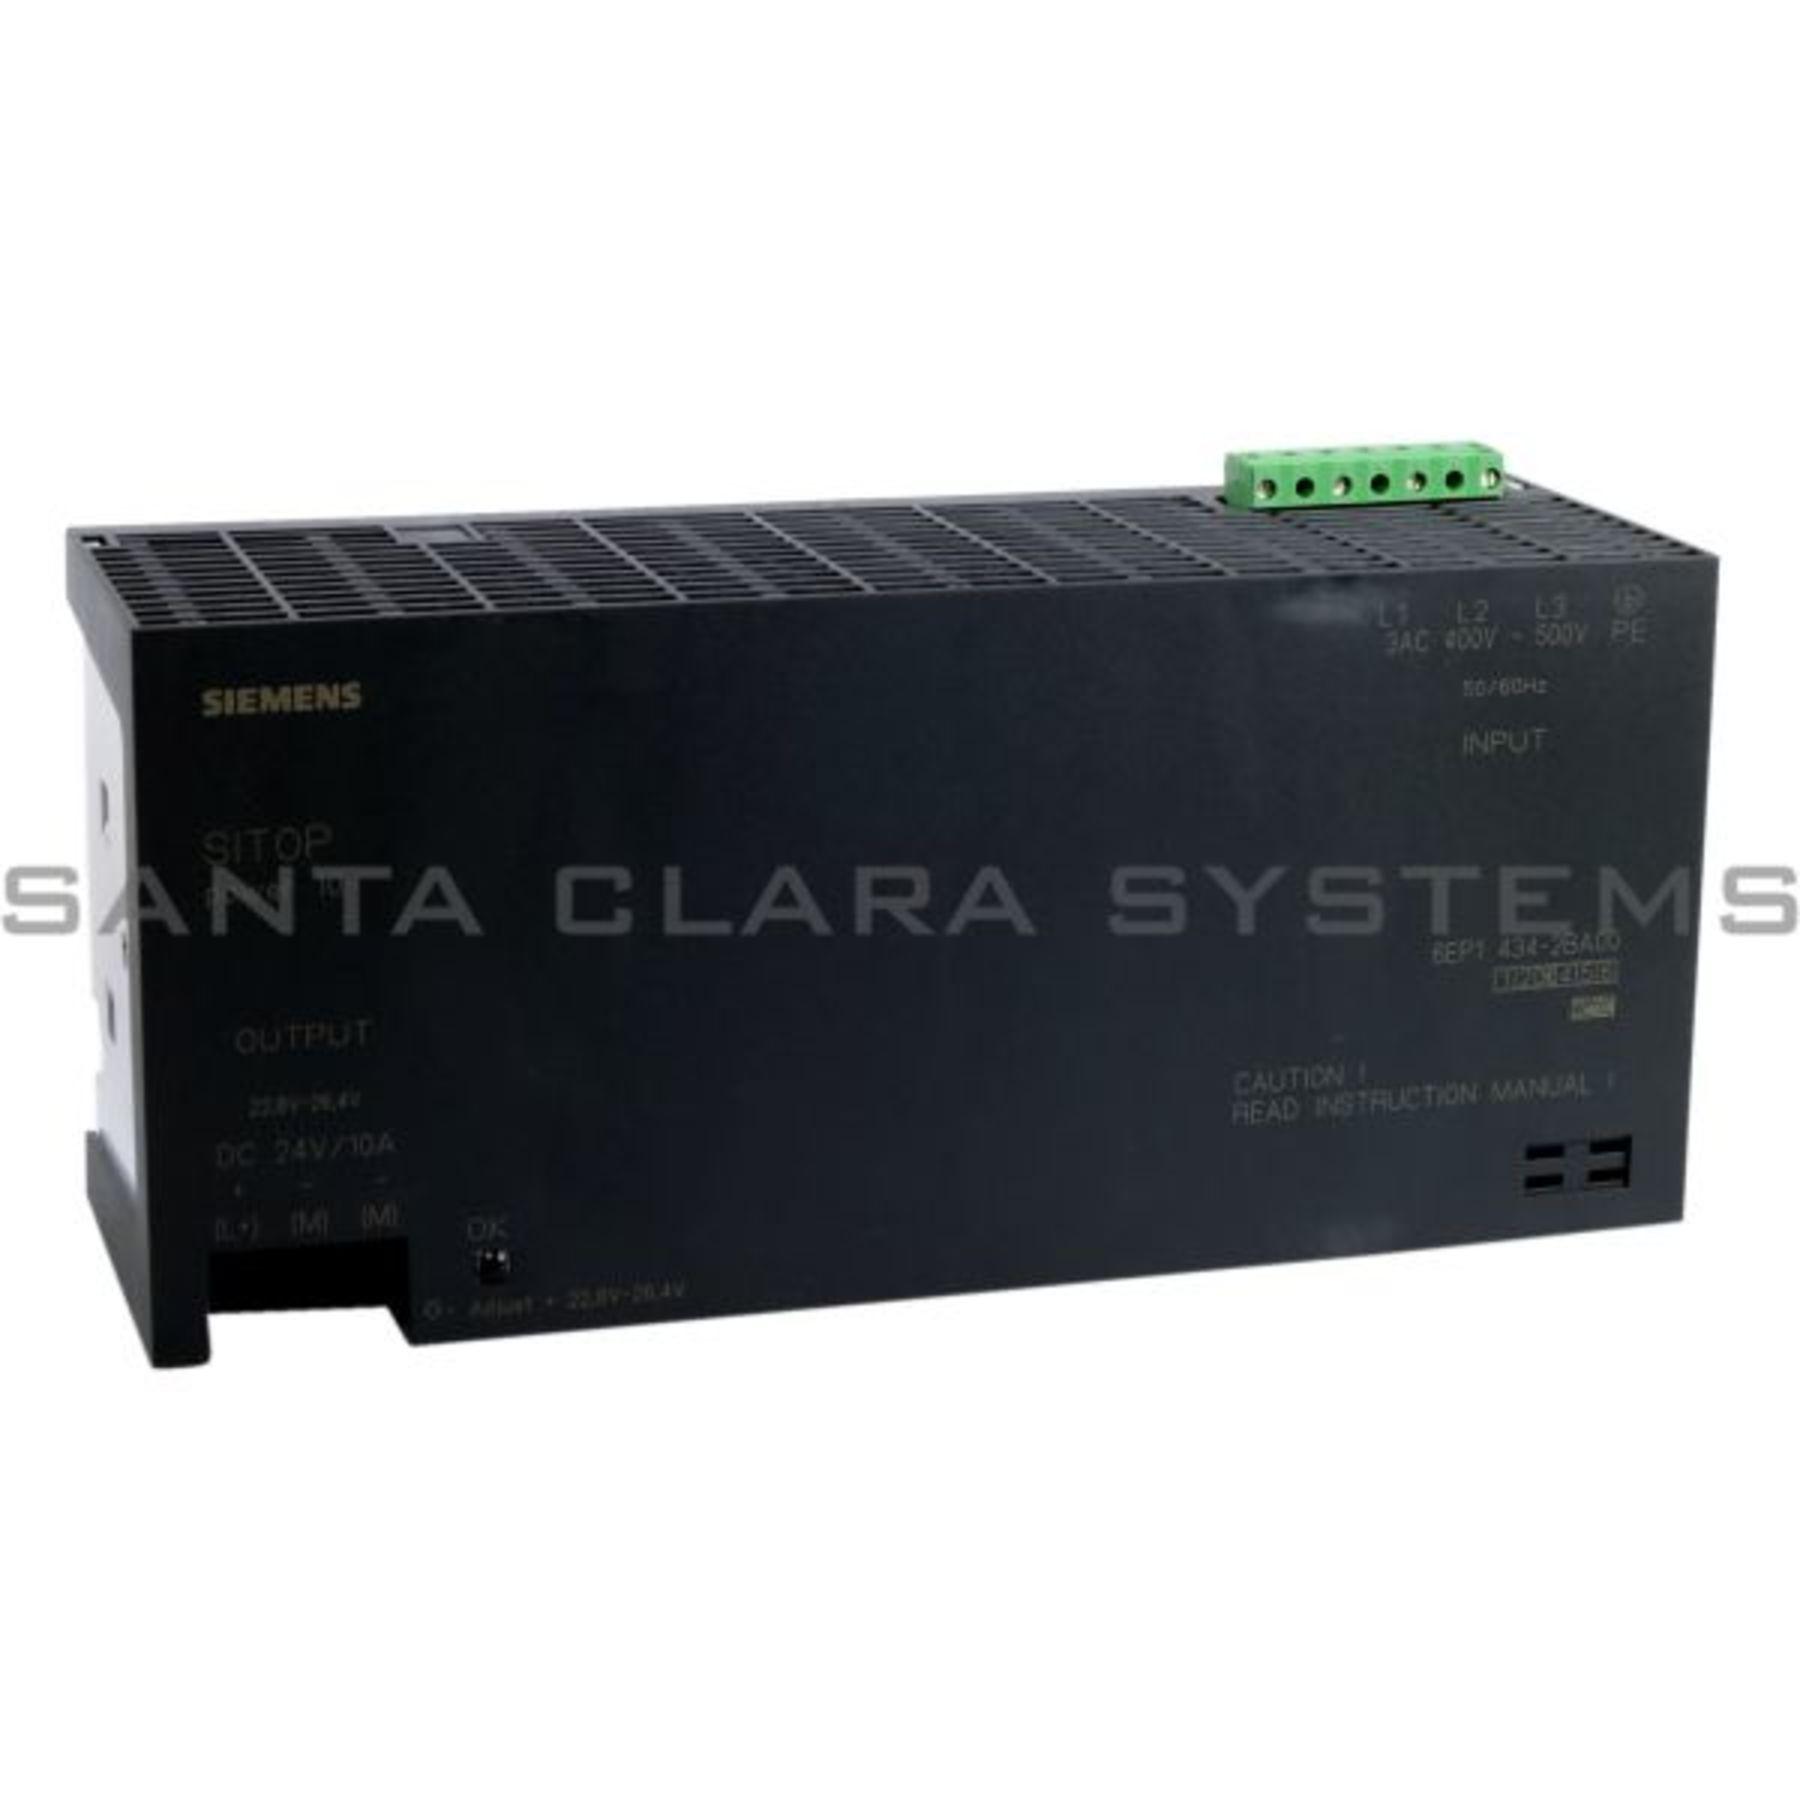 Siemens SITOP Power 10 Power Supply 6ep1434-2ba00//6ep1 434-2ba00